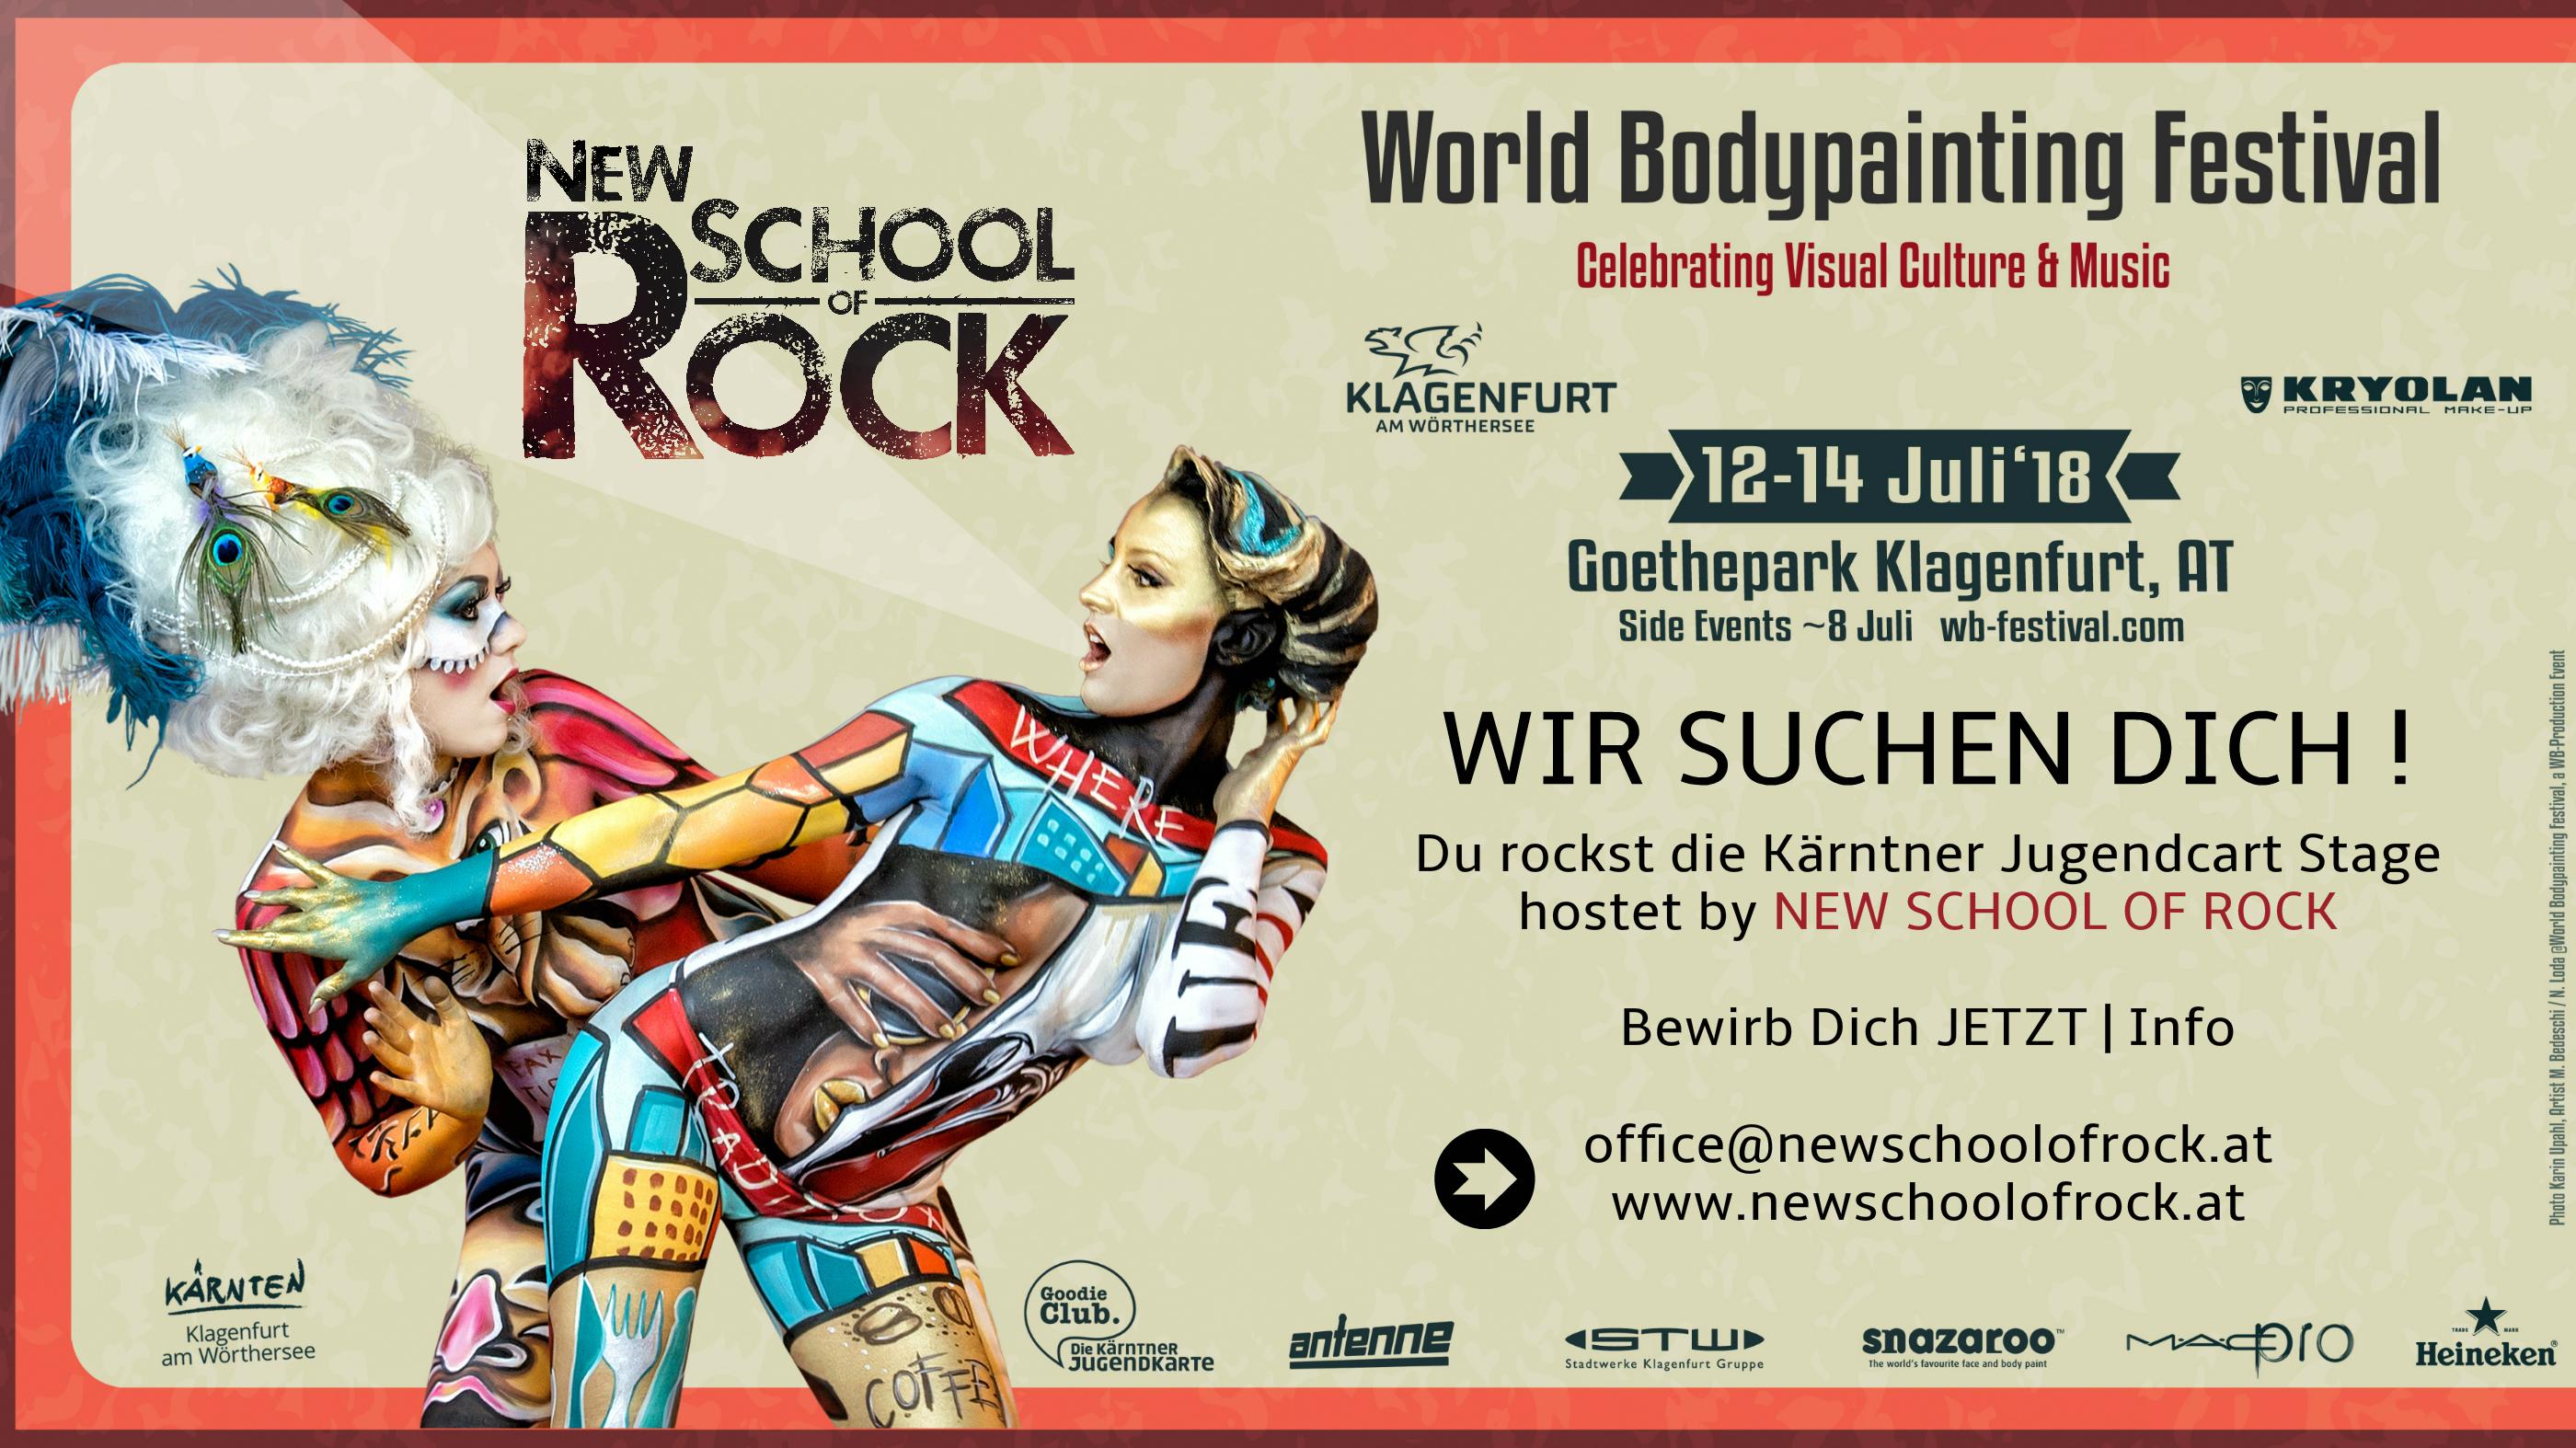 Bewerbung für 12 SLOT'S WBF Festival